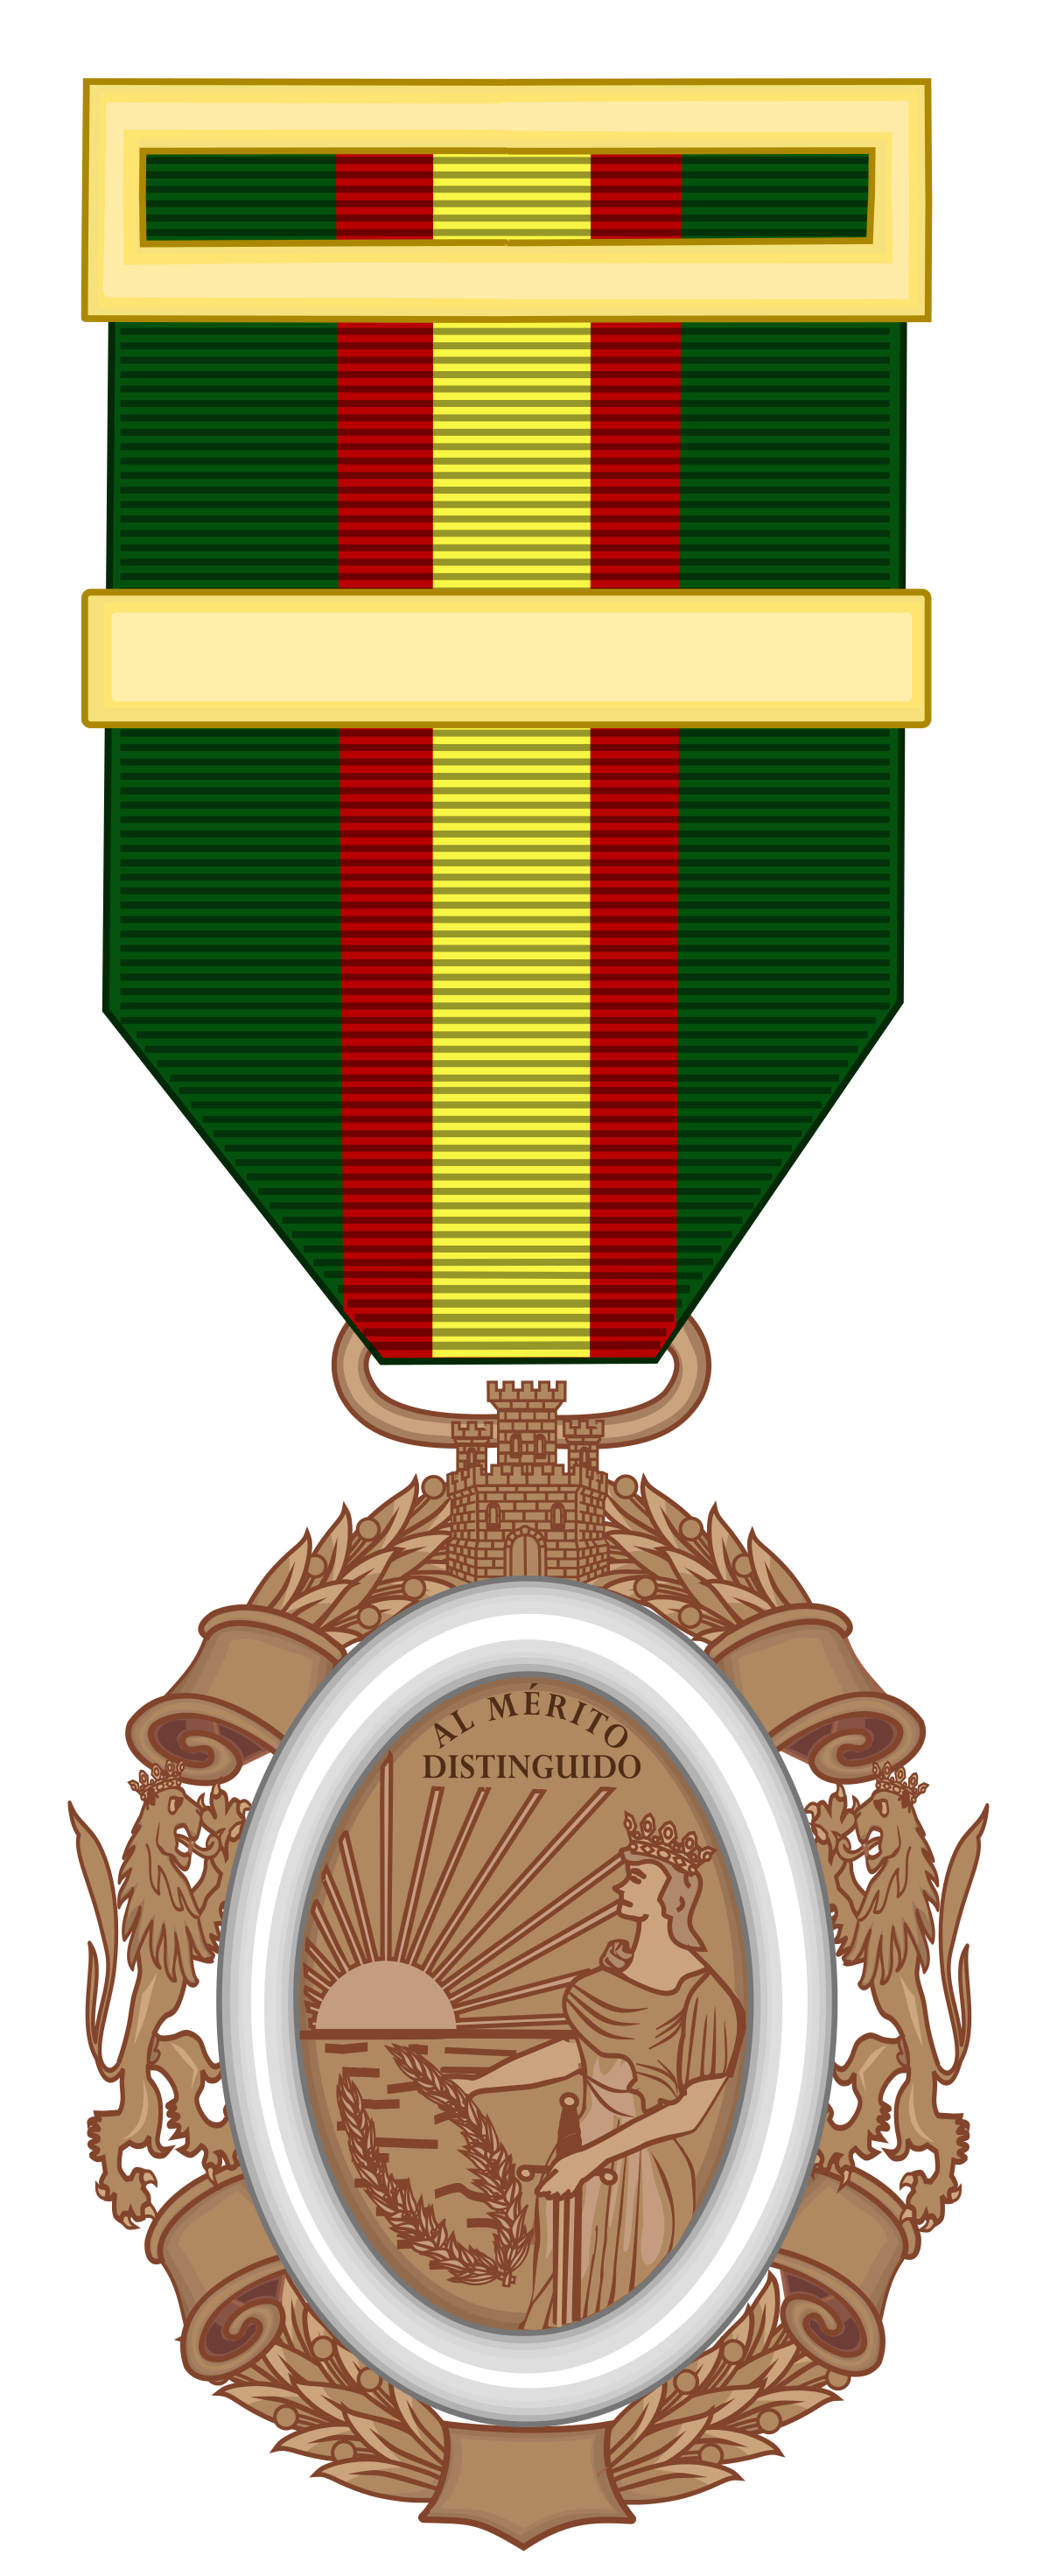 Medal clipart medal stand. Medalla del ej rcito